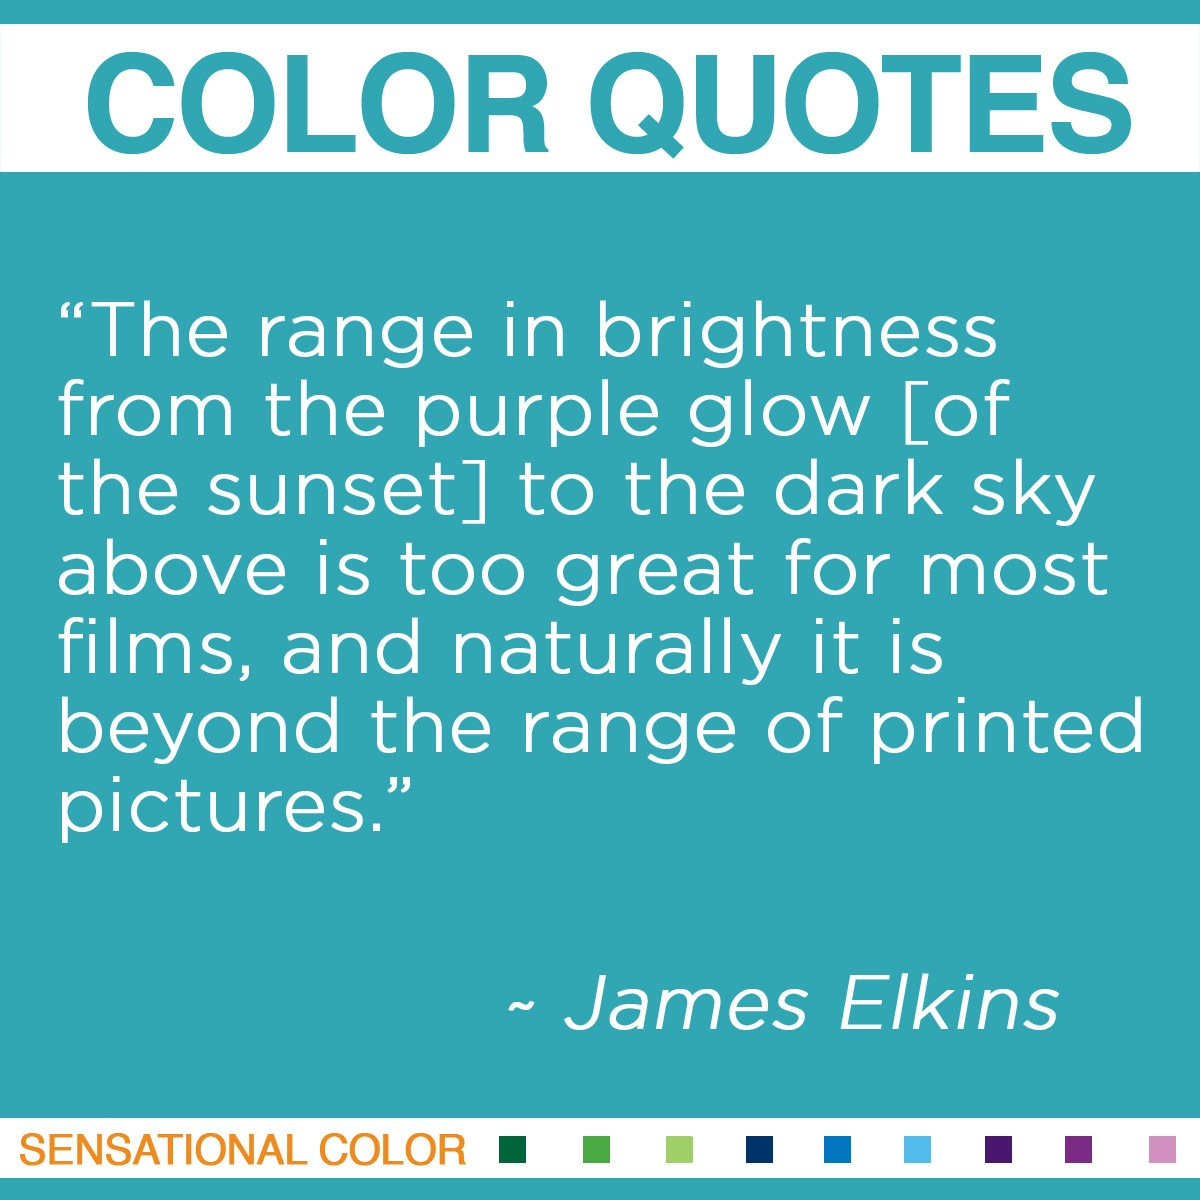 Elkins Quote About Color